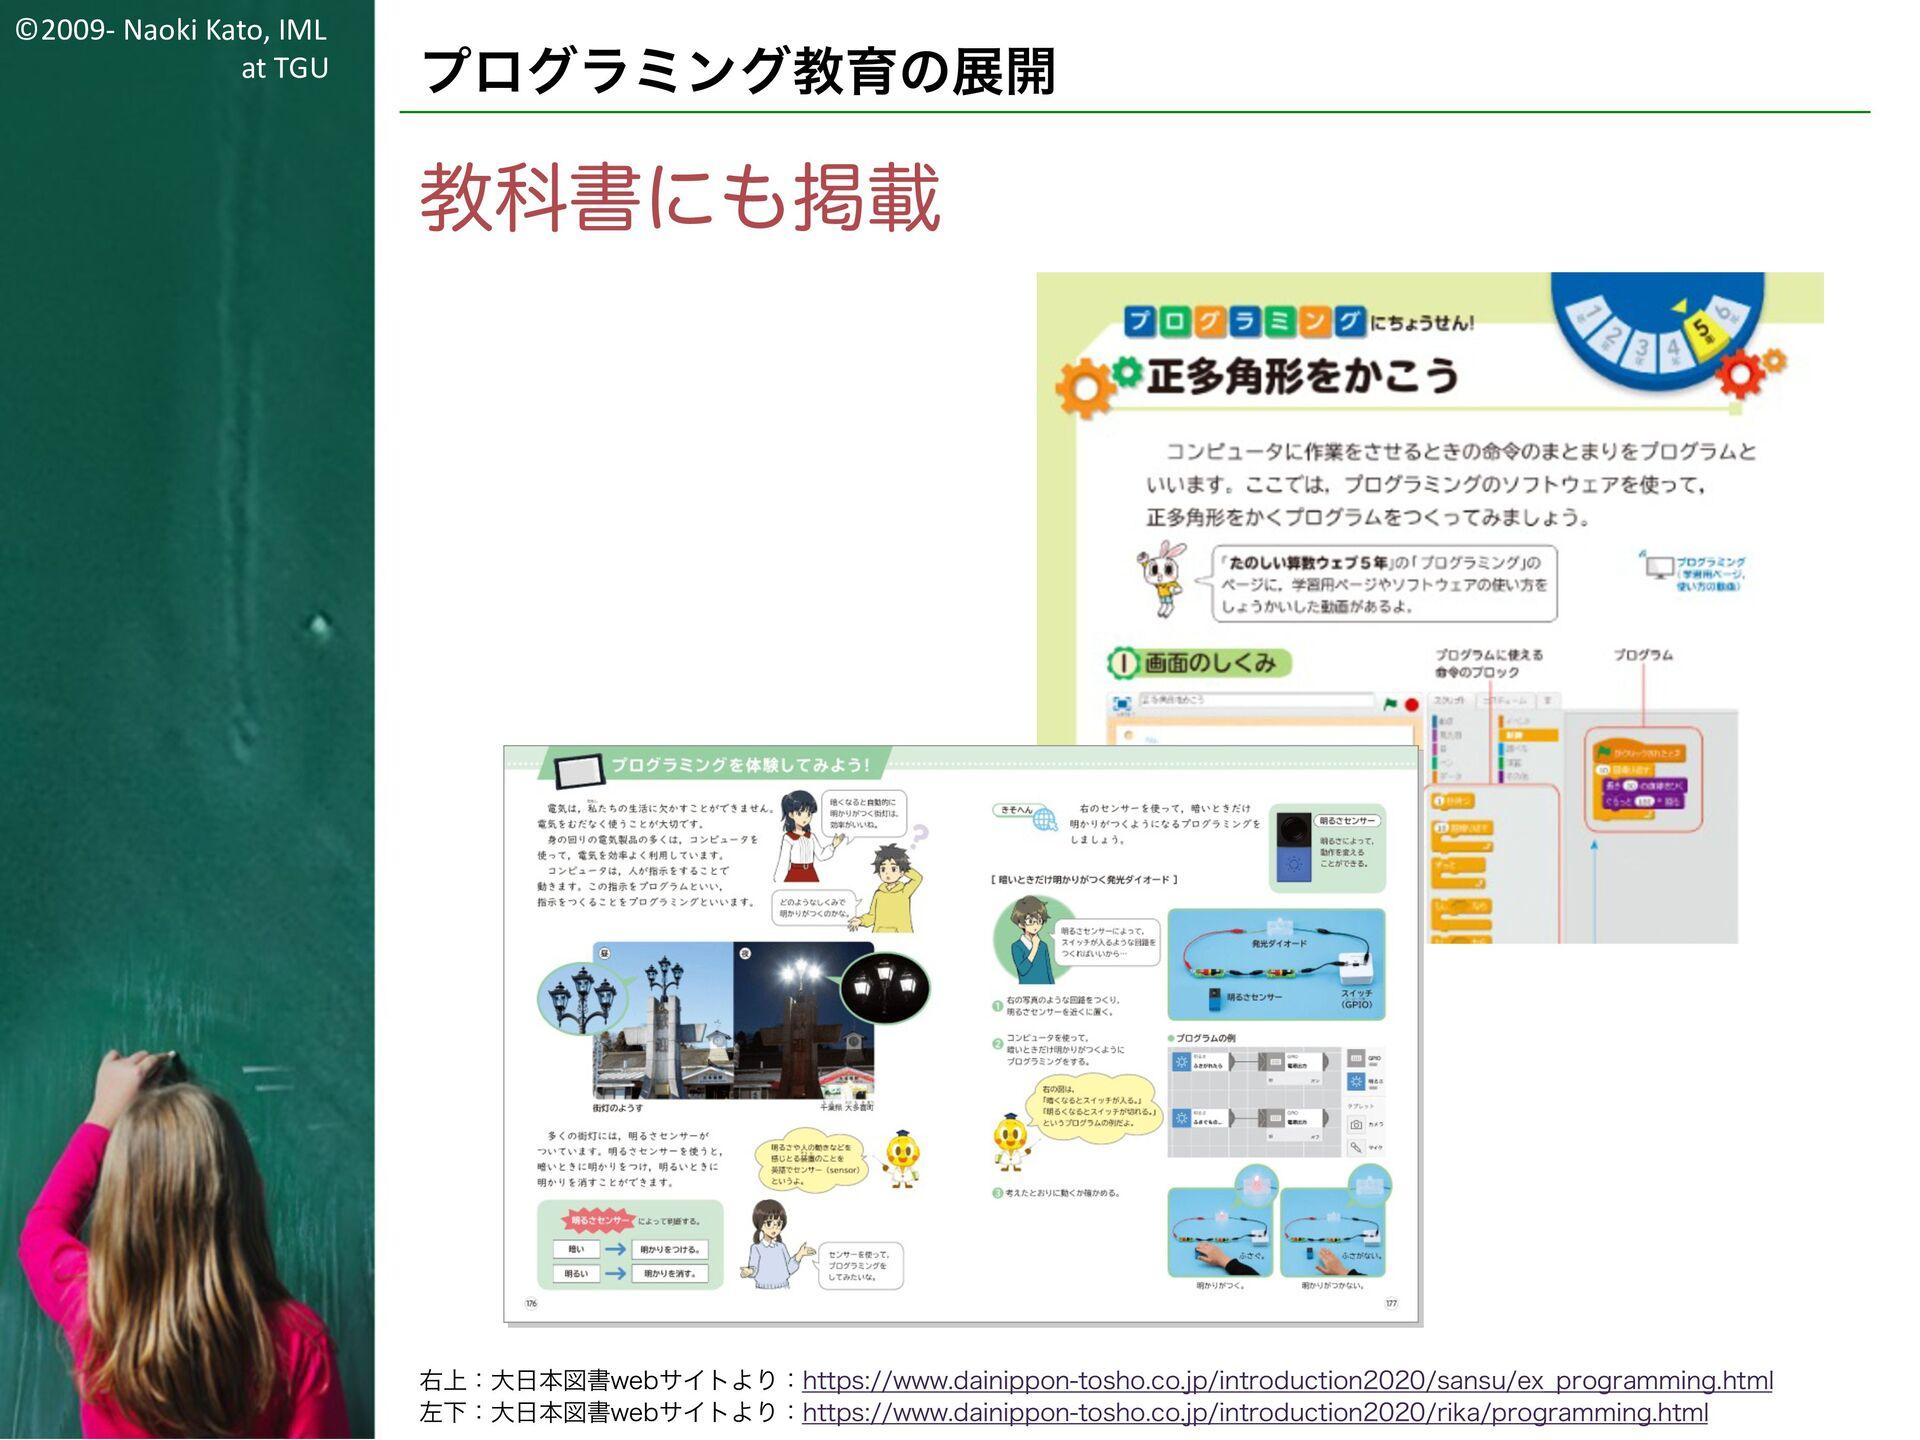 ©2009- Naoki Kato, IML at TGU プログラミング教育の展開 そのため...